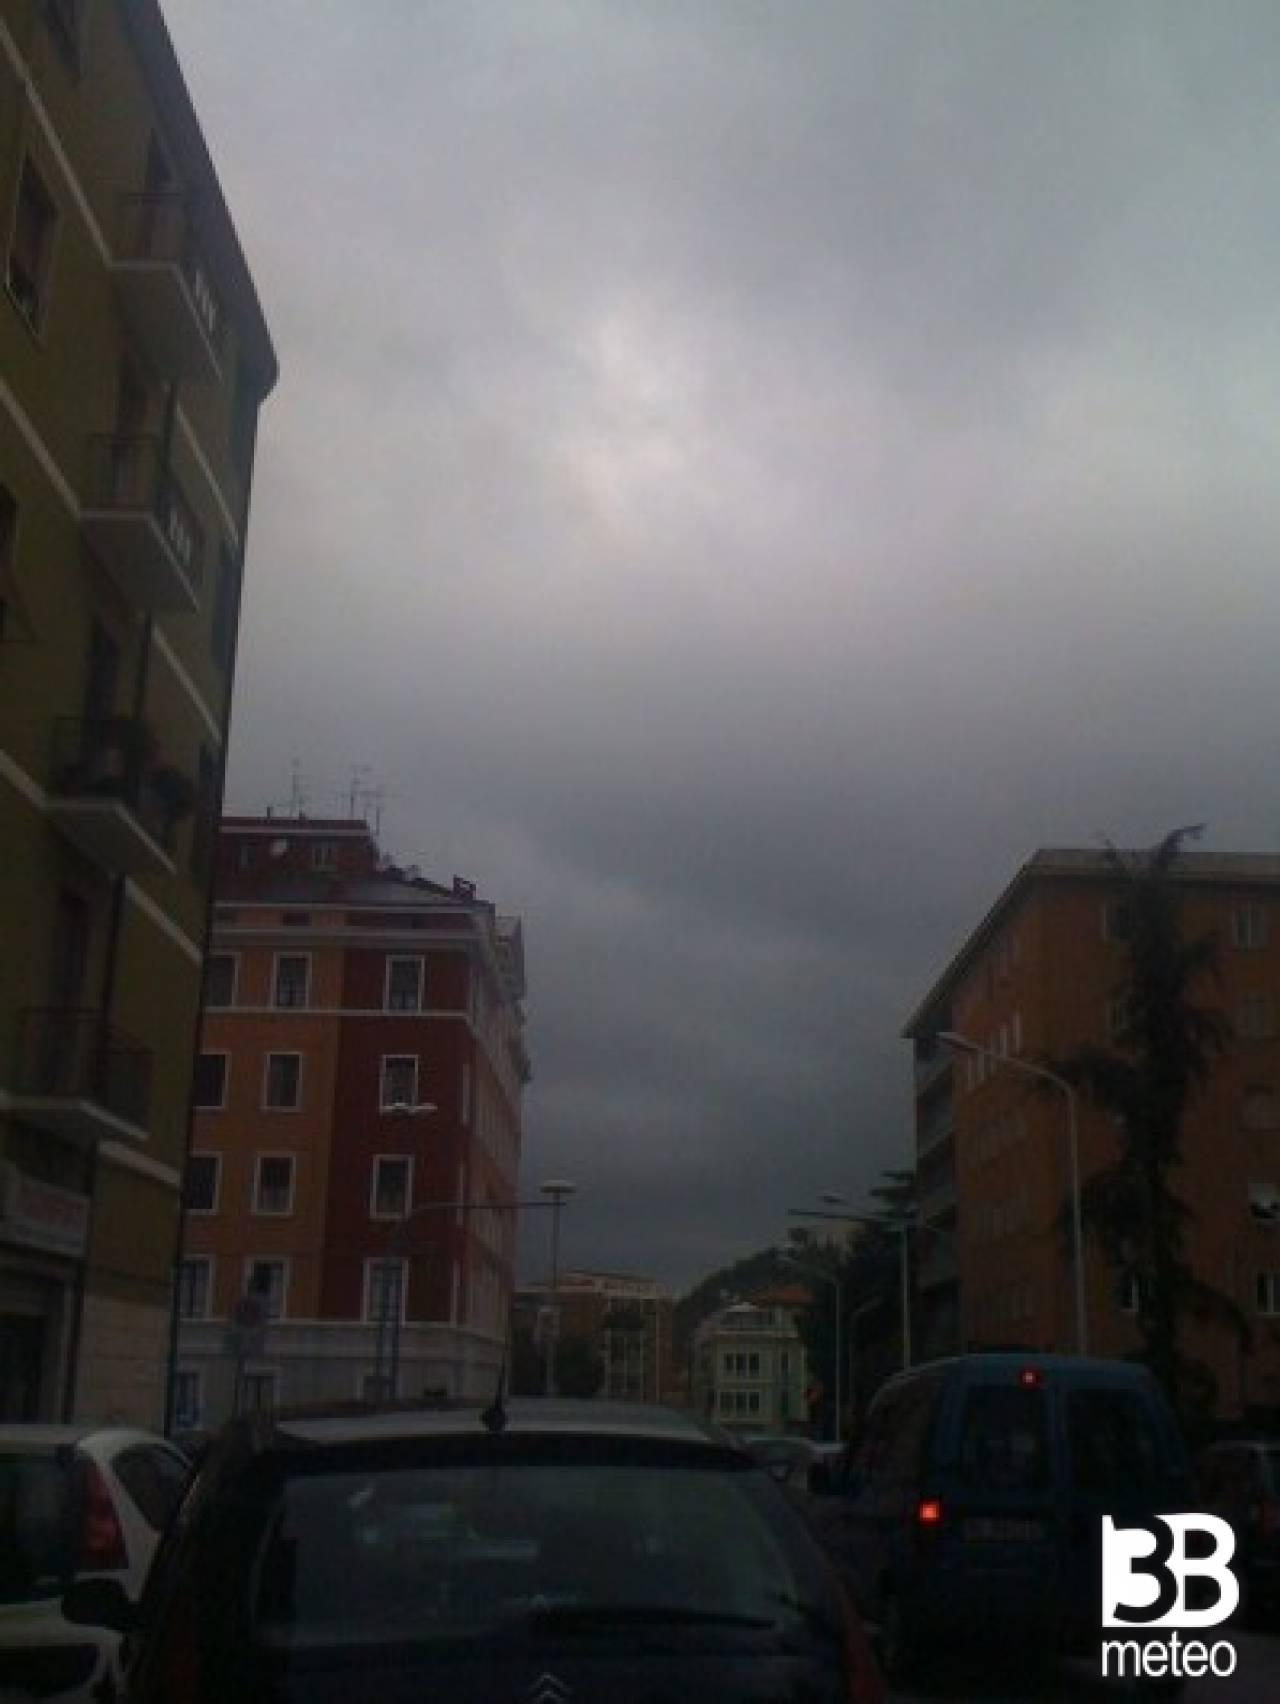 Meteo Campobasso: martedì piogge, poi variabile - 3bmeteo